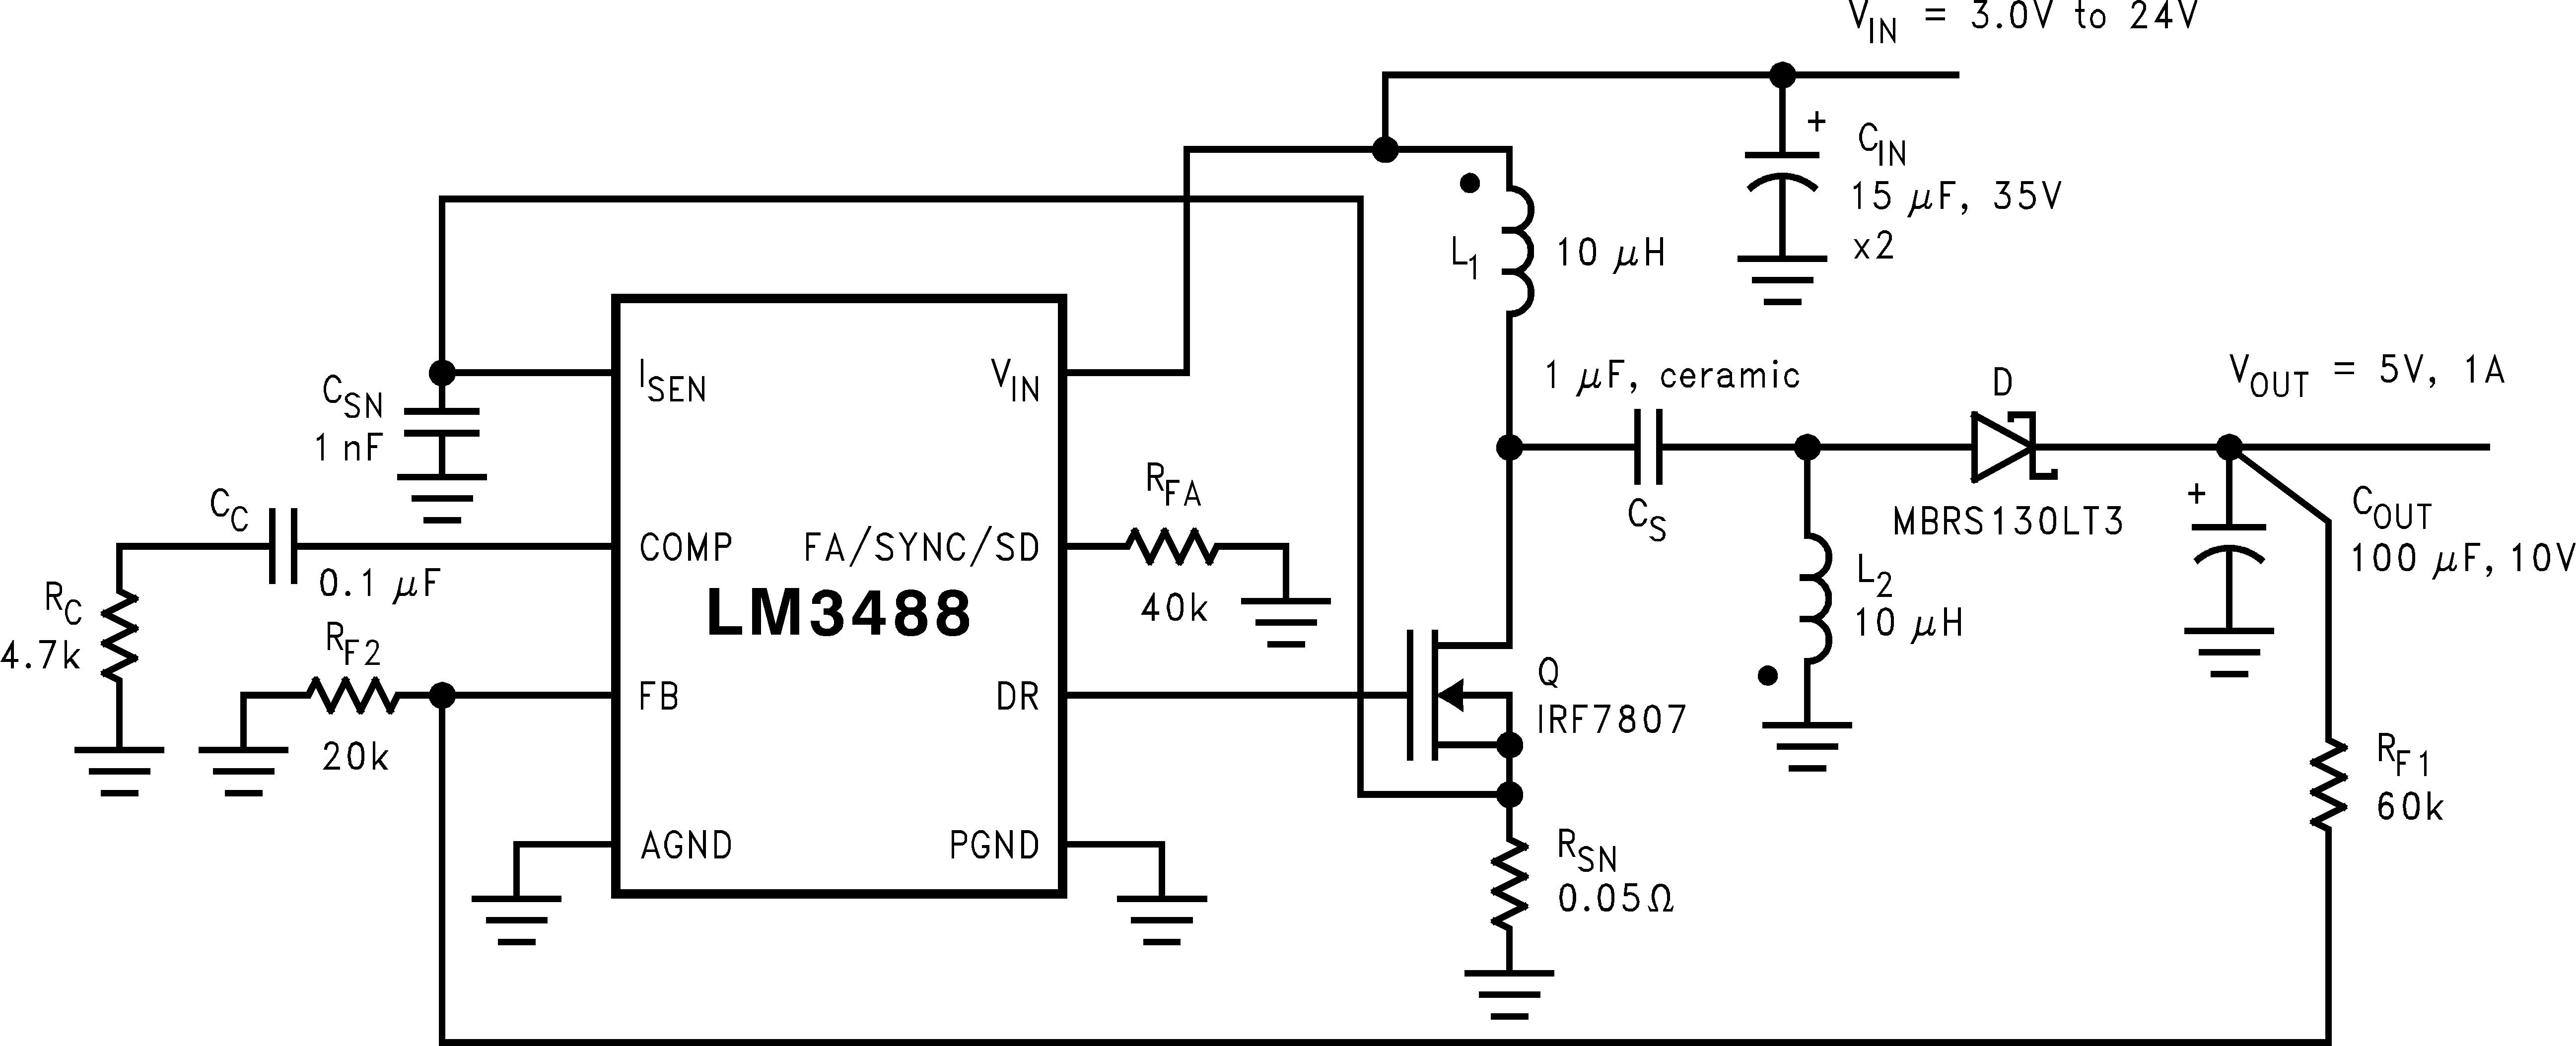 Lm3488q Q1 Converter Design Lm3488 Dc Buck Boost Sepic Schematic